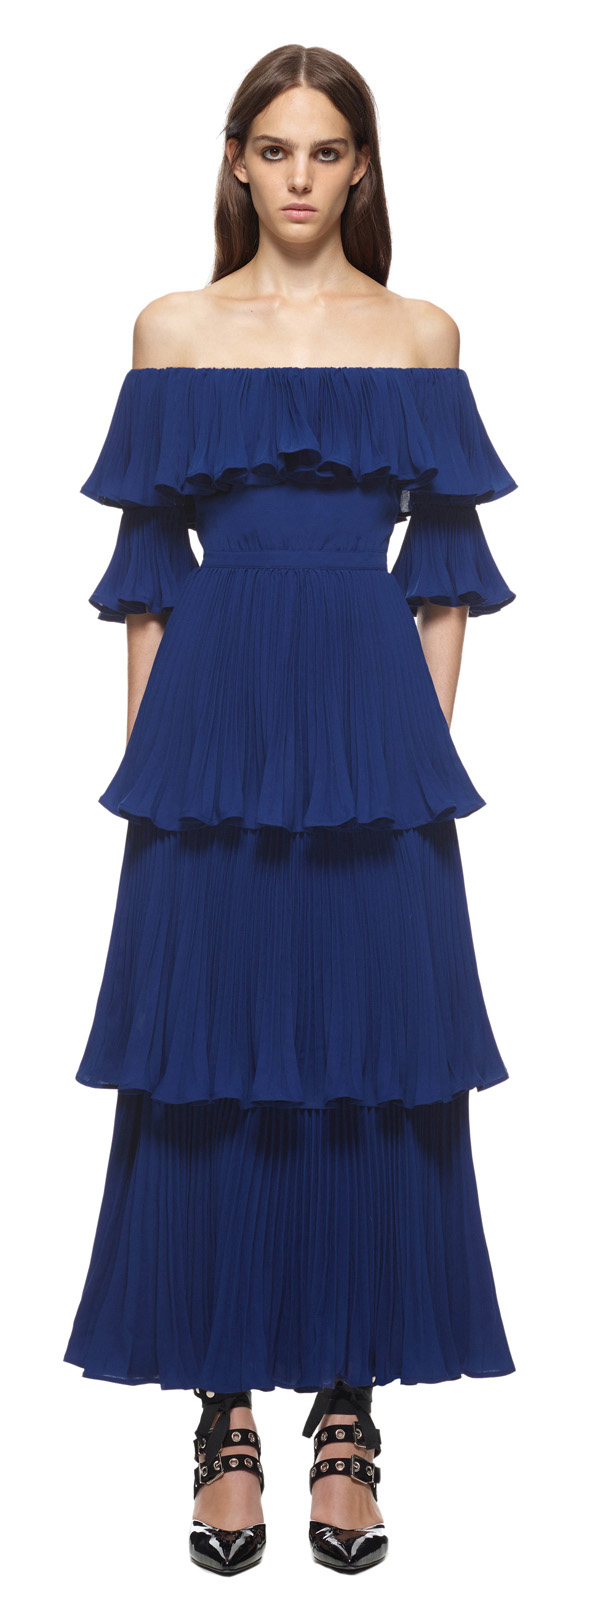 Self Portrait Flounced Off Shoulder Dress